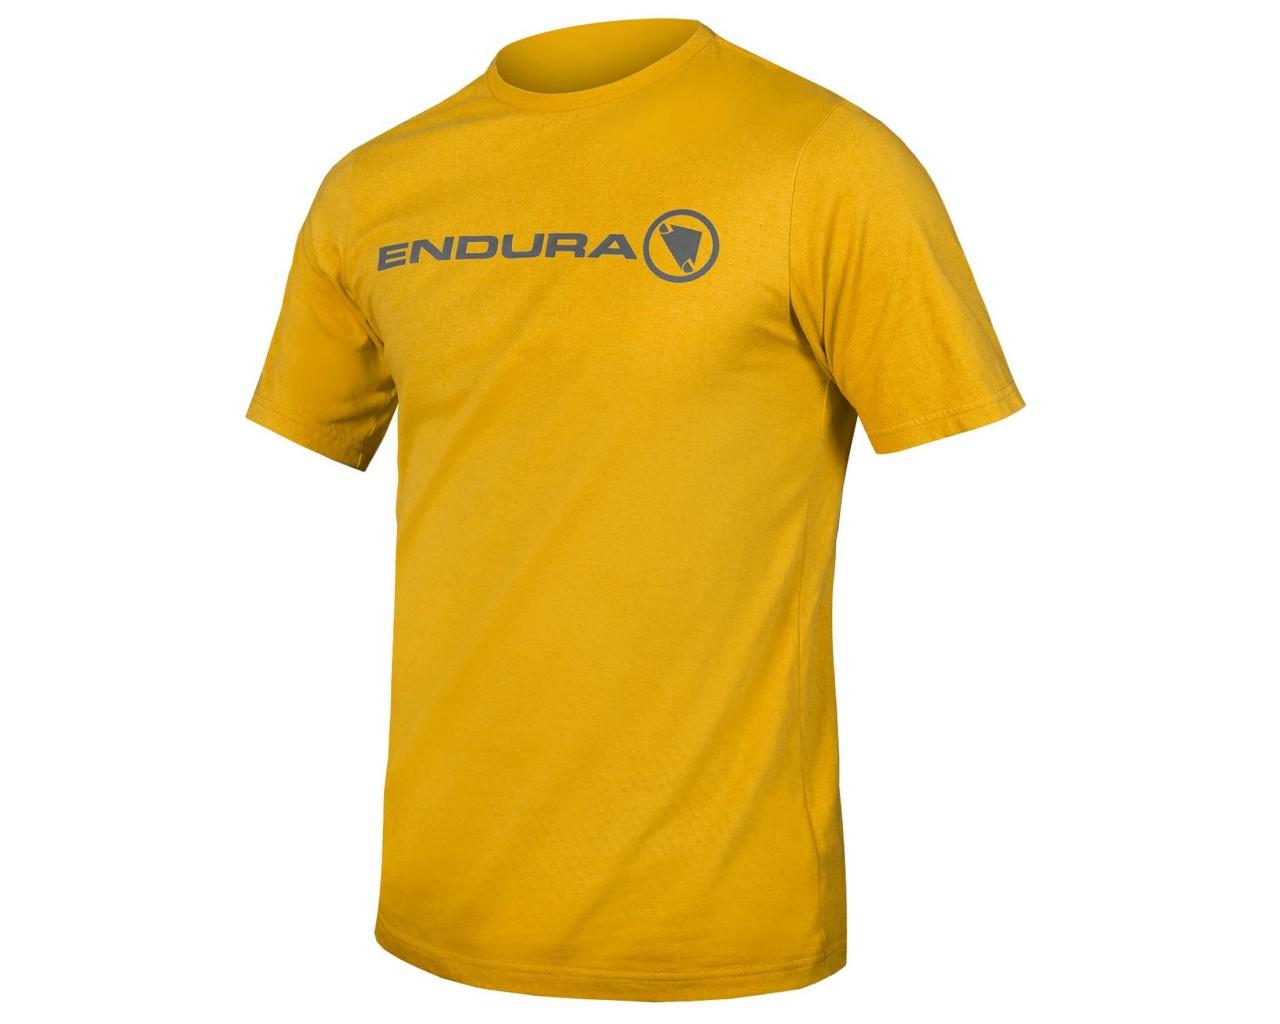 Endura One Clan Light T-Shirt | mustard